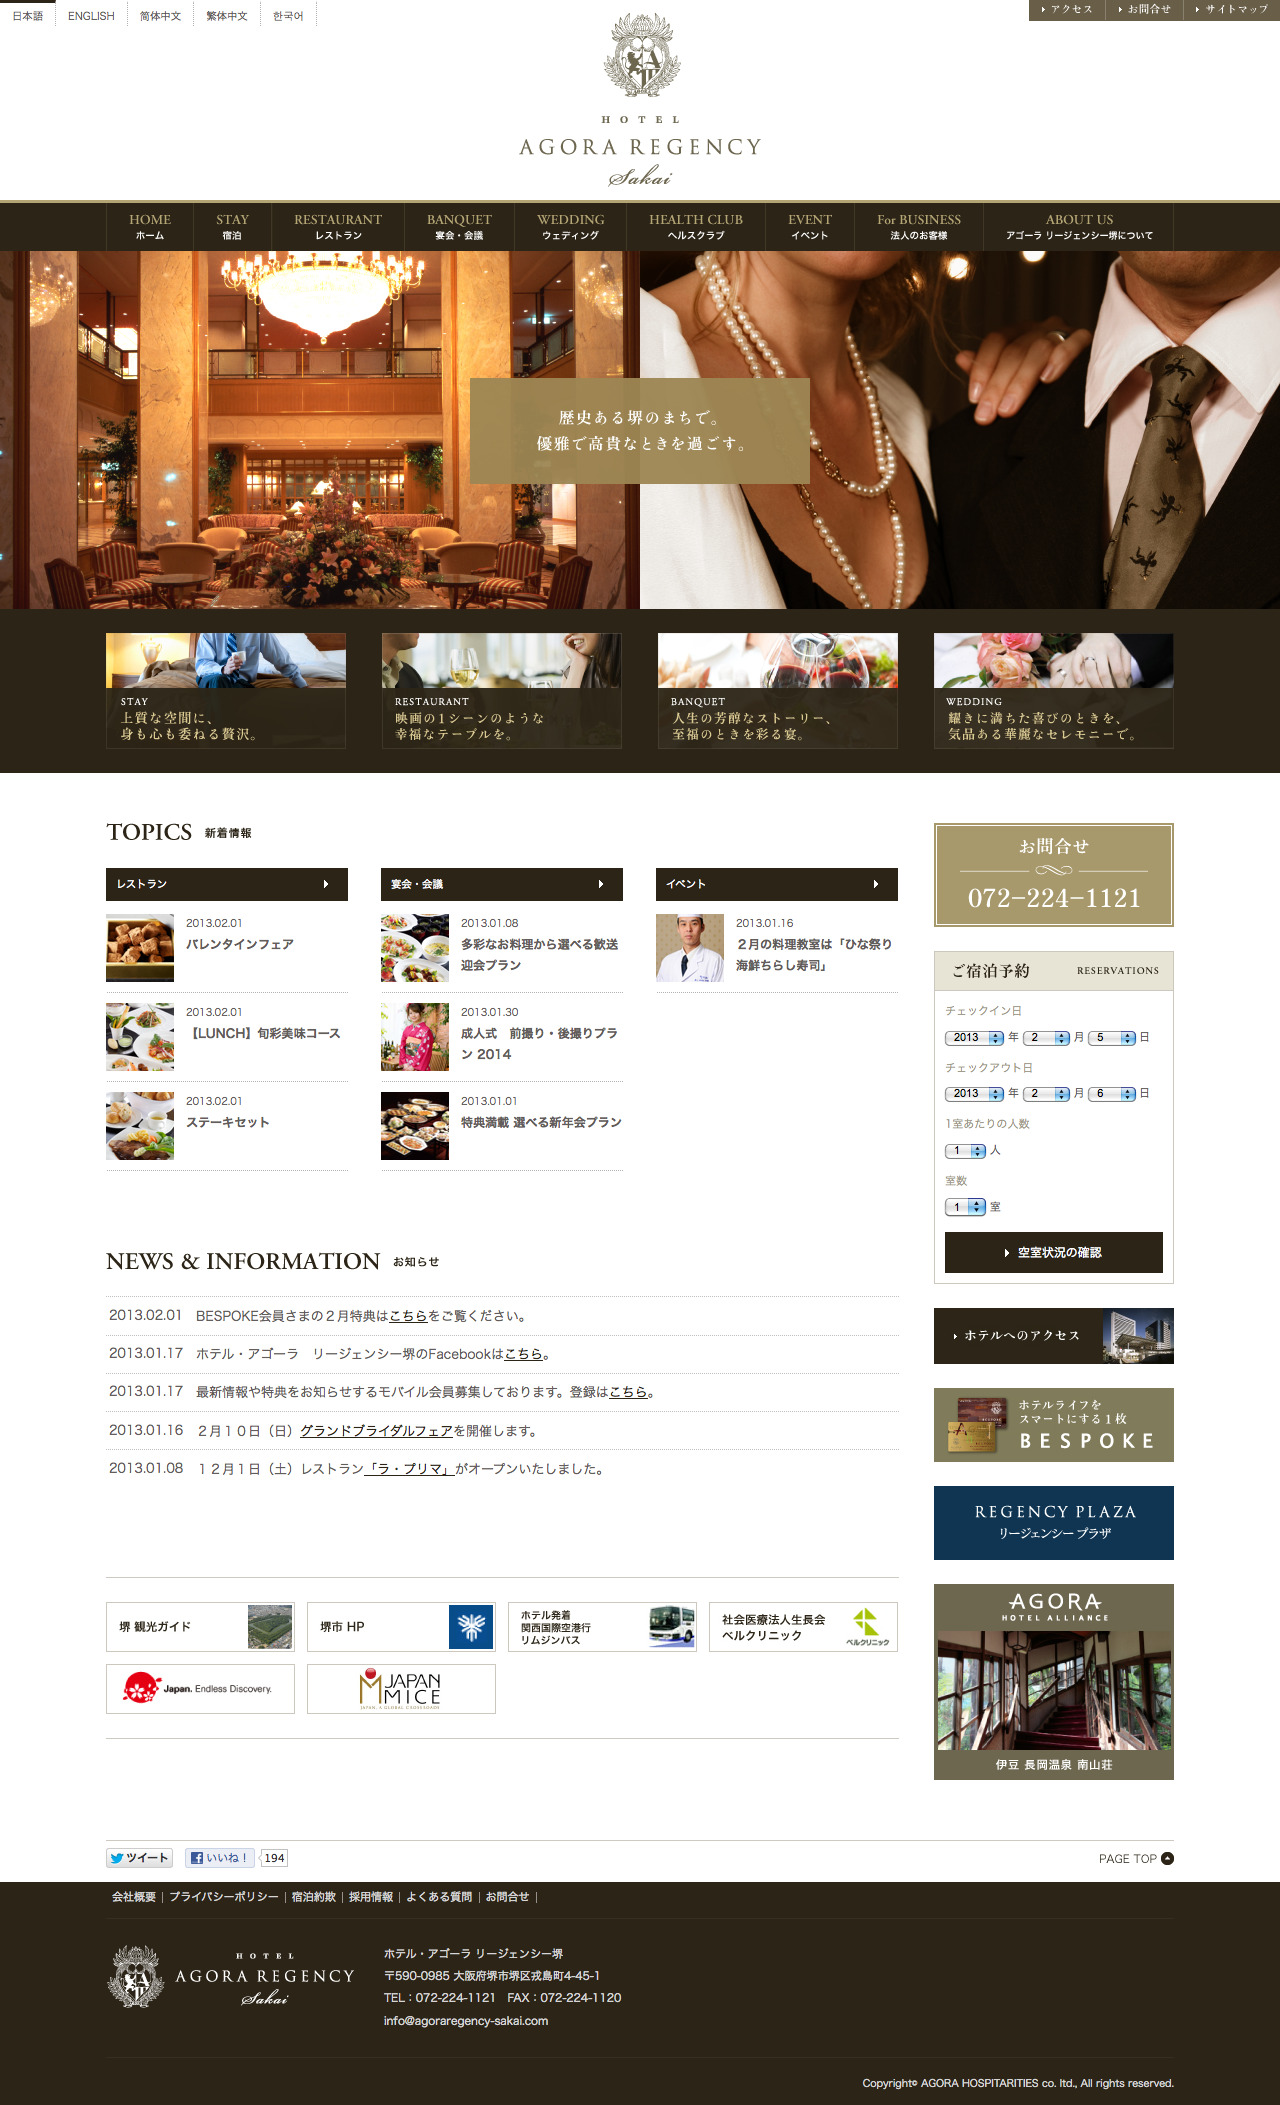 hotel AGORA Regency Sakai  ホテル・アゴーラ リージェンシー堺